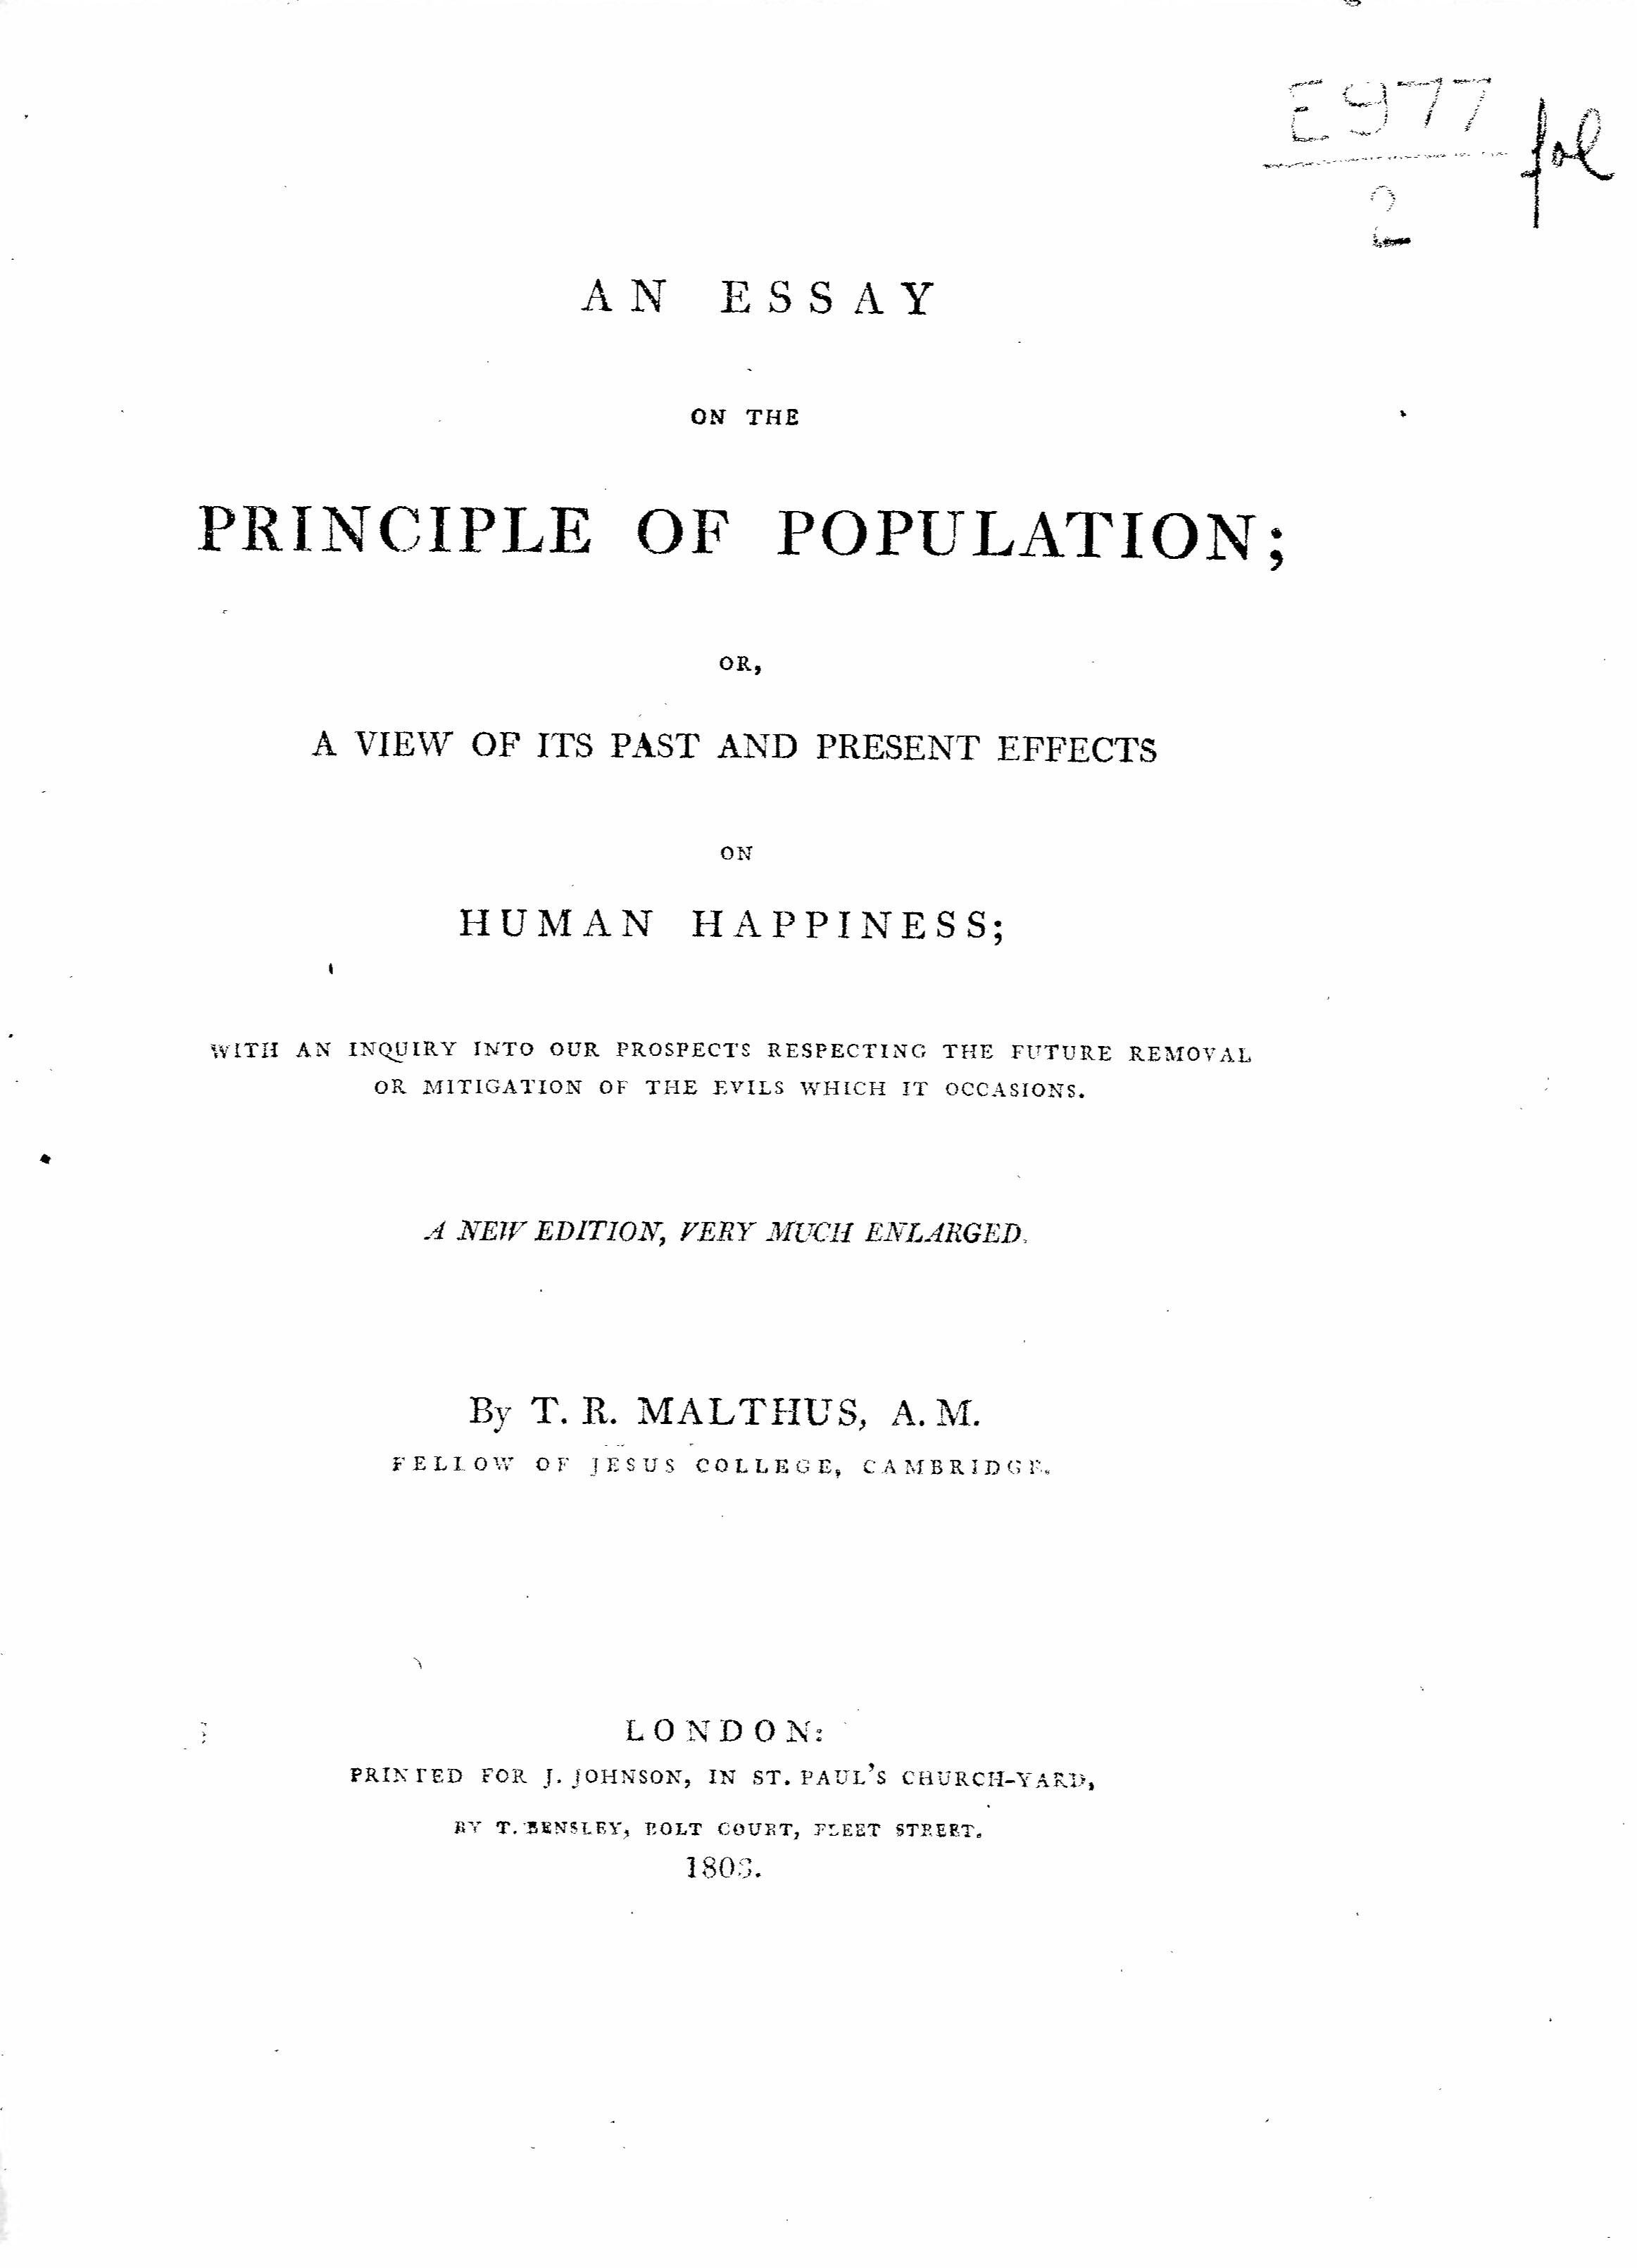 002 Thomas Malthus Essay On The Principle Of Population 2fol Stupendous After Reading Malthus's Principles Darwin Got Idea That Ap Euro Full